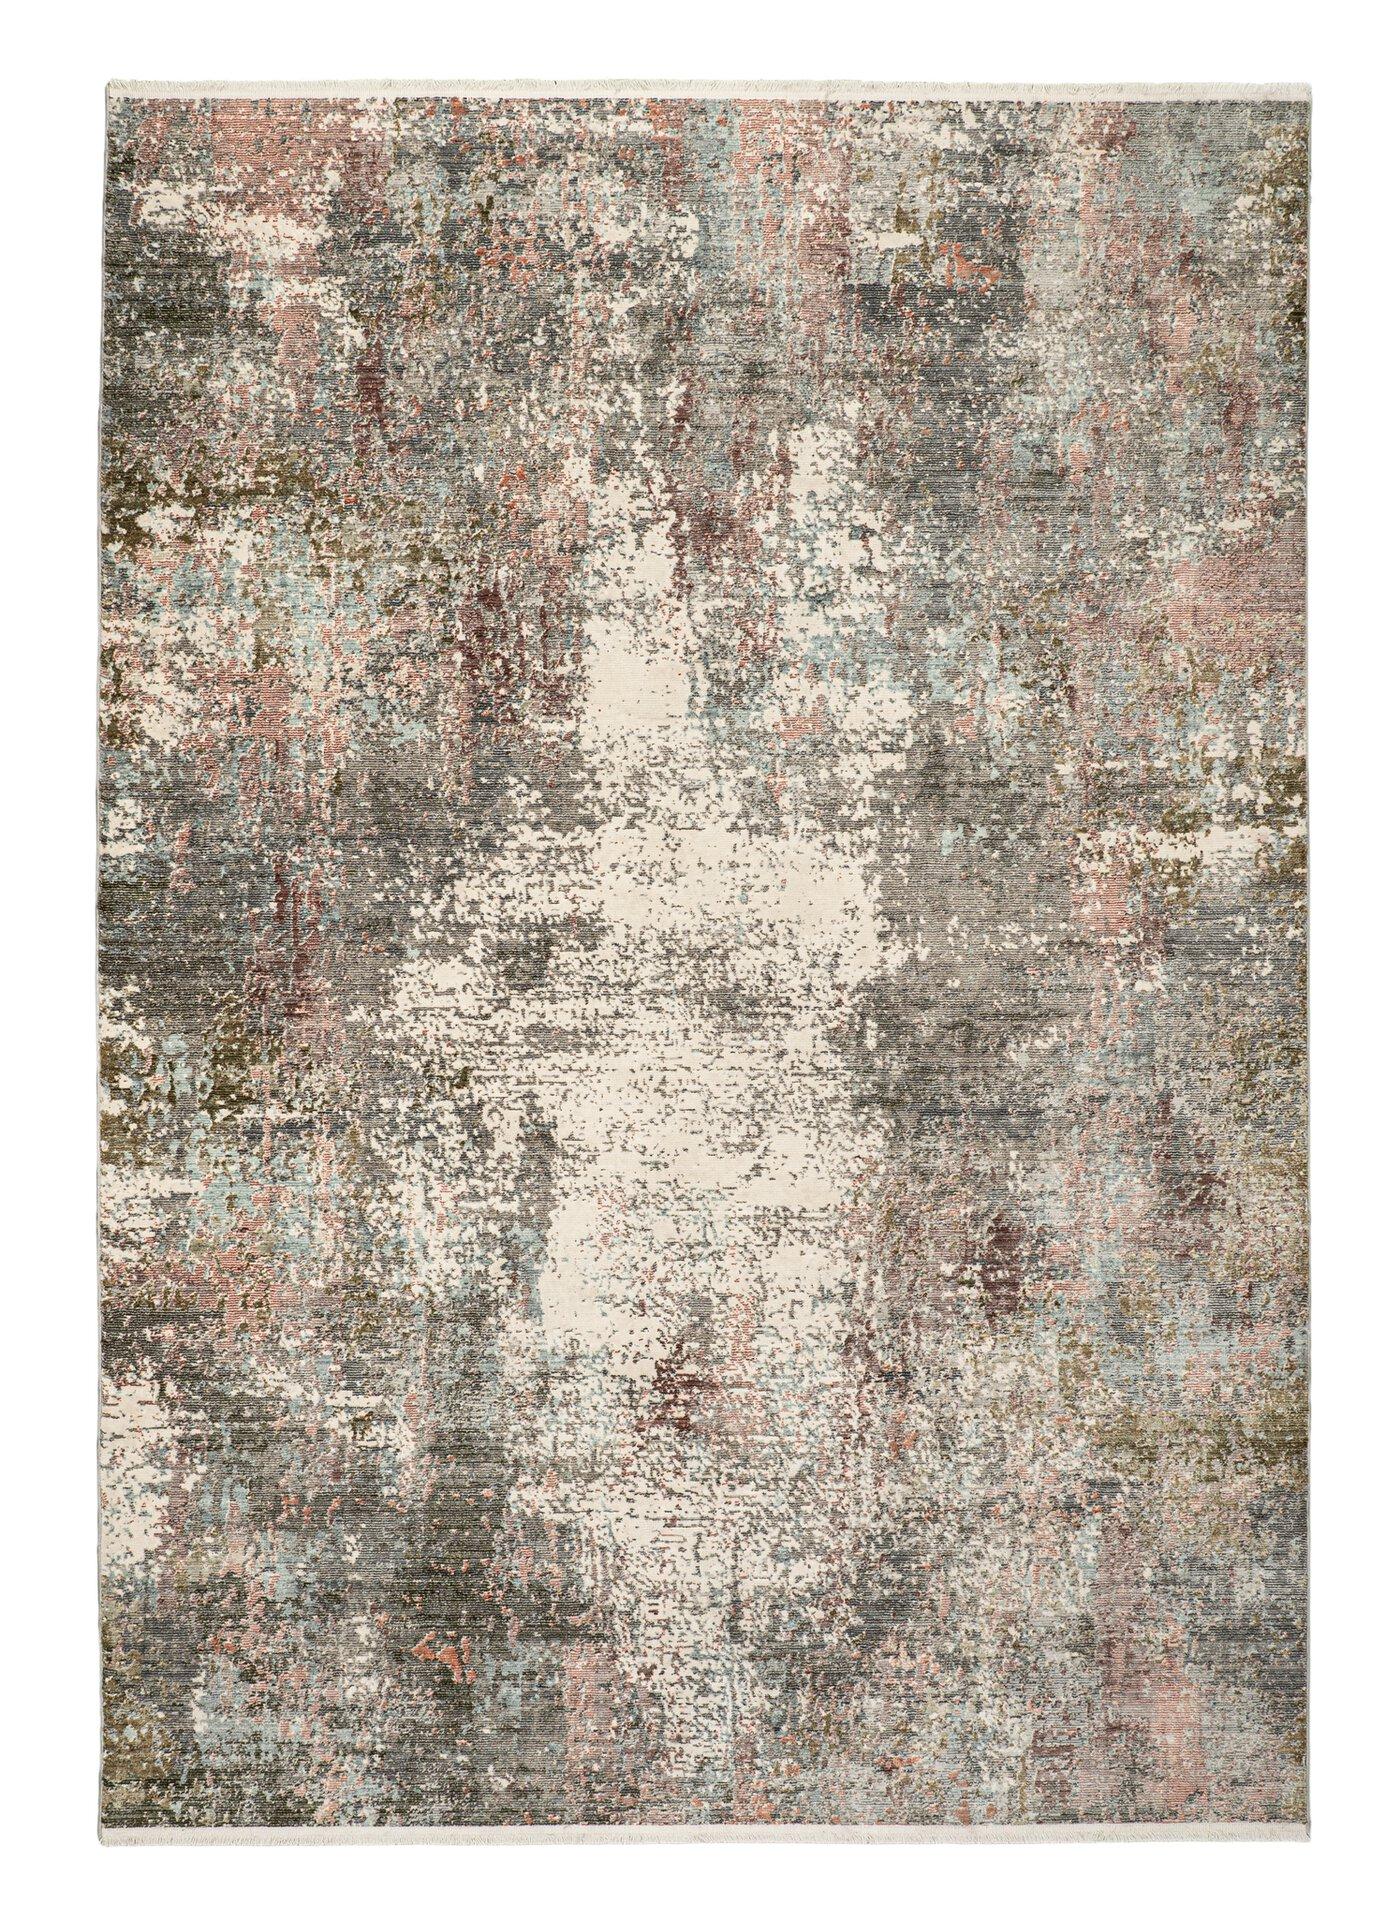 Maschinenwebteppich Aleo merinos Textil grau 120 x 170 cm